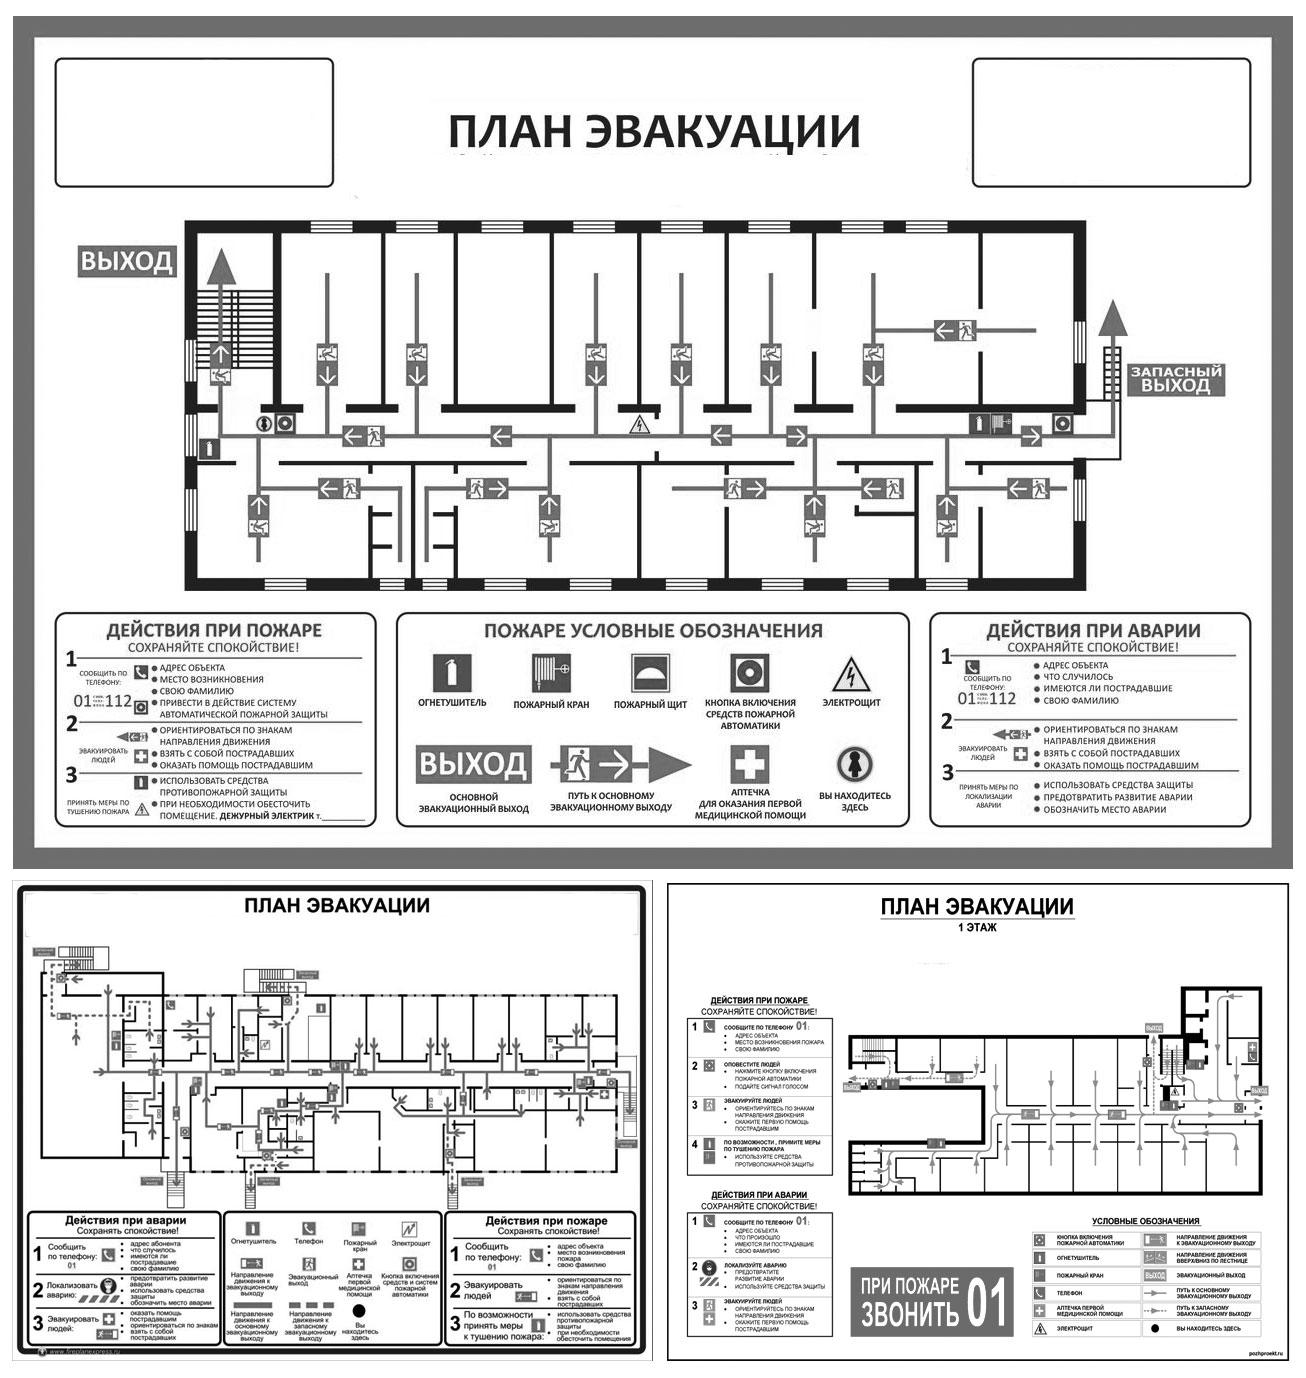 план эвакуации Воронеж